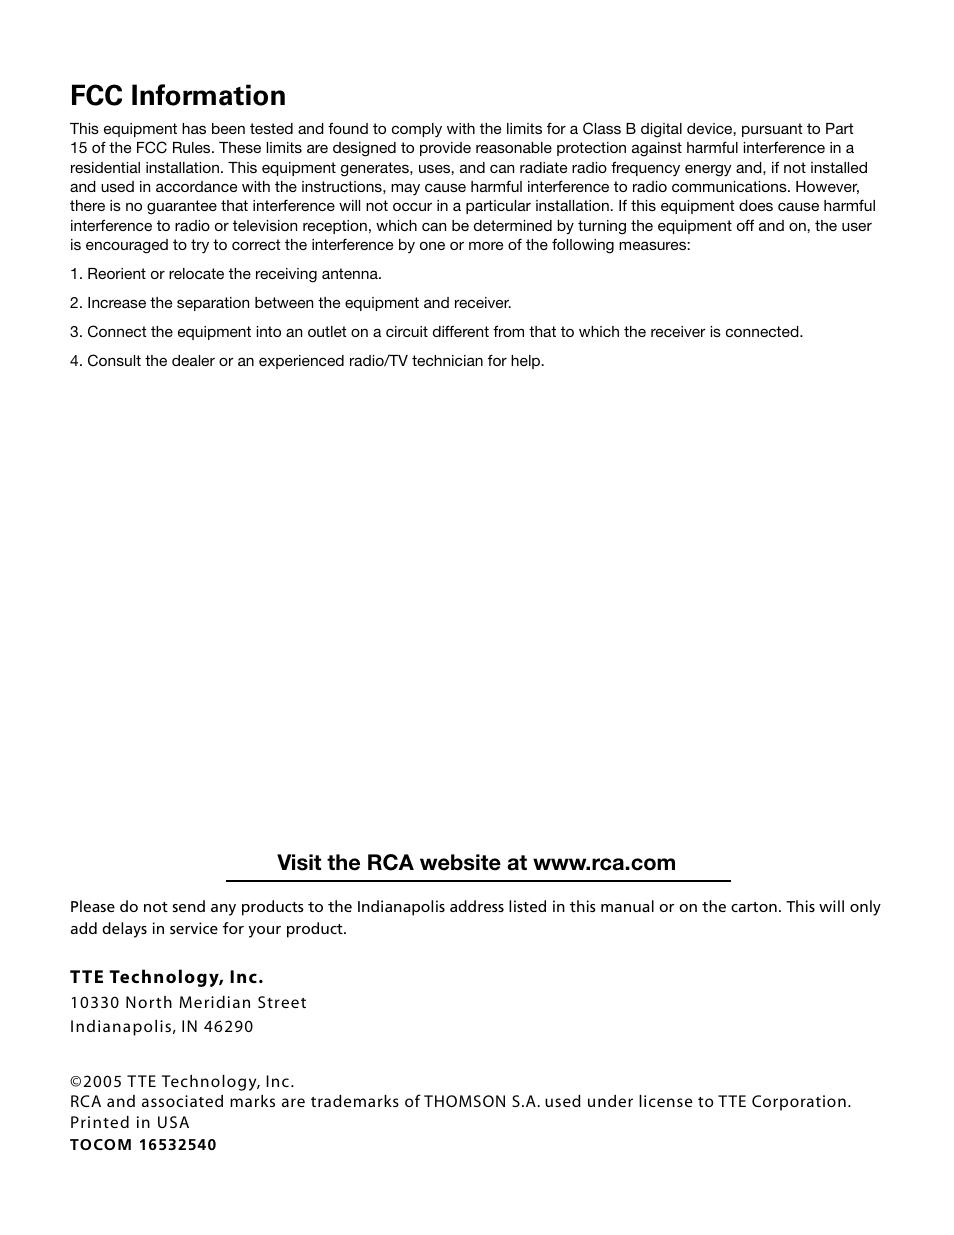 rca website manual on